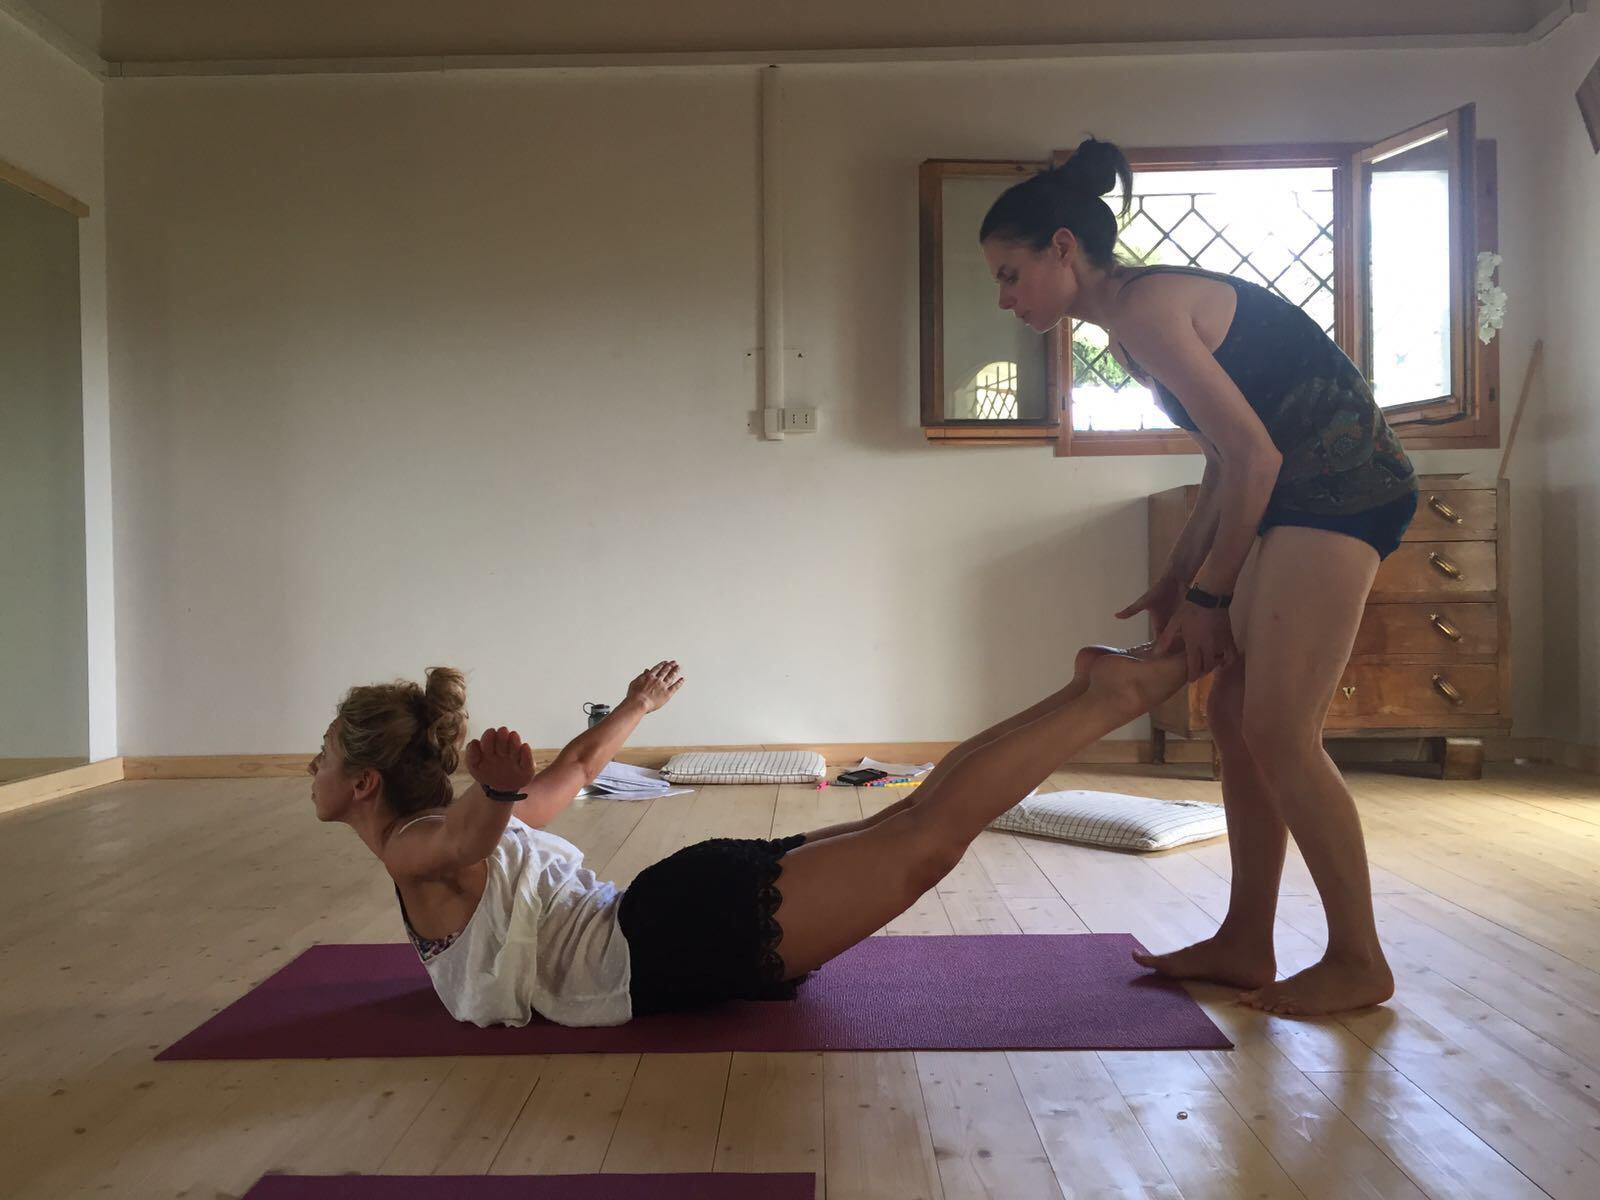 250-hour-hot-yoga-teacher-training-bologna-italy-pose.jpg